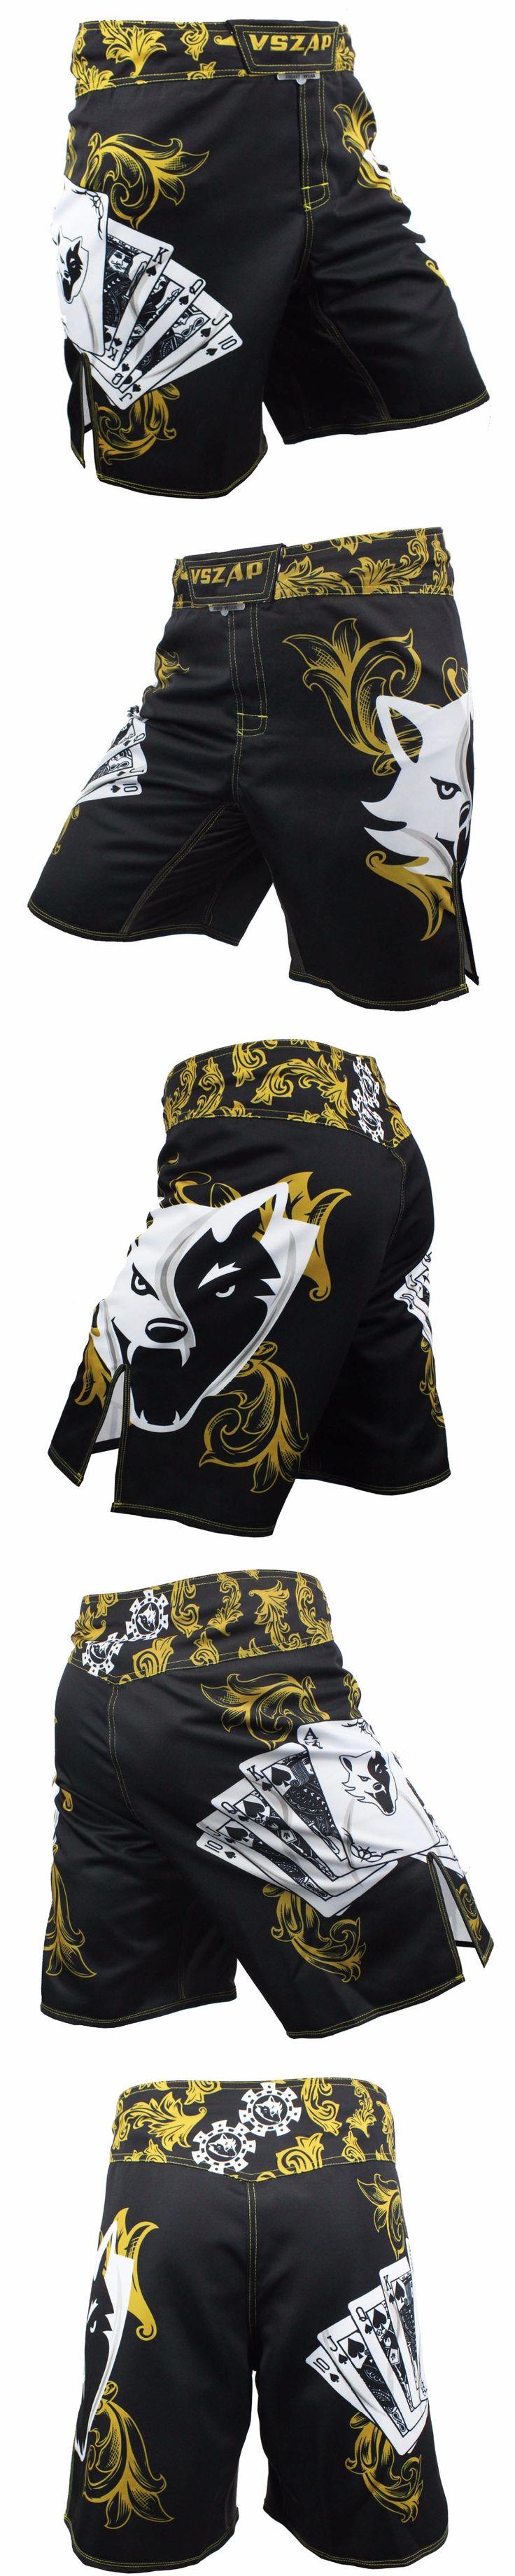 MMA  Shorts Cage Fighting Grappling   Muay Thai Kickboxing Short poker pattern VSZAP